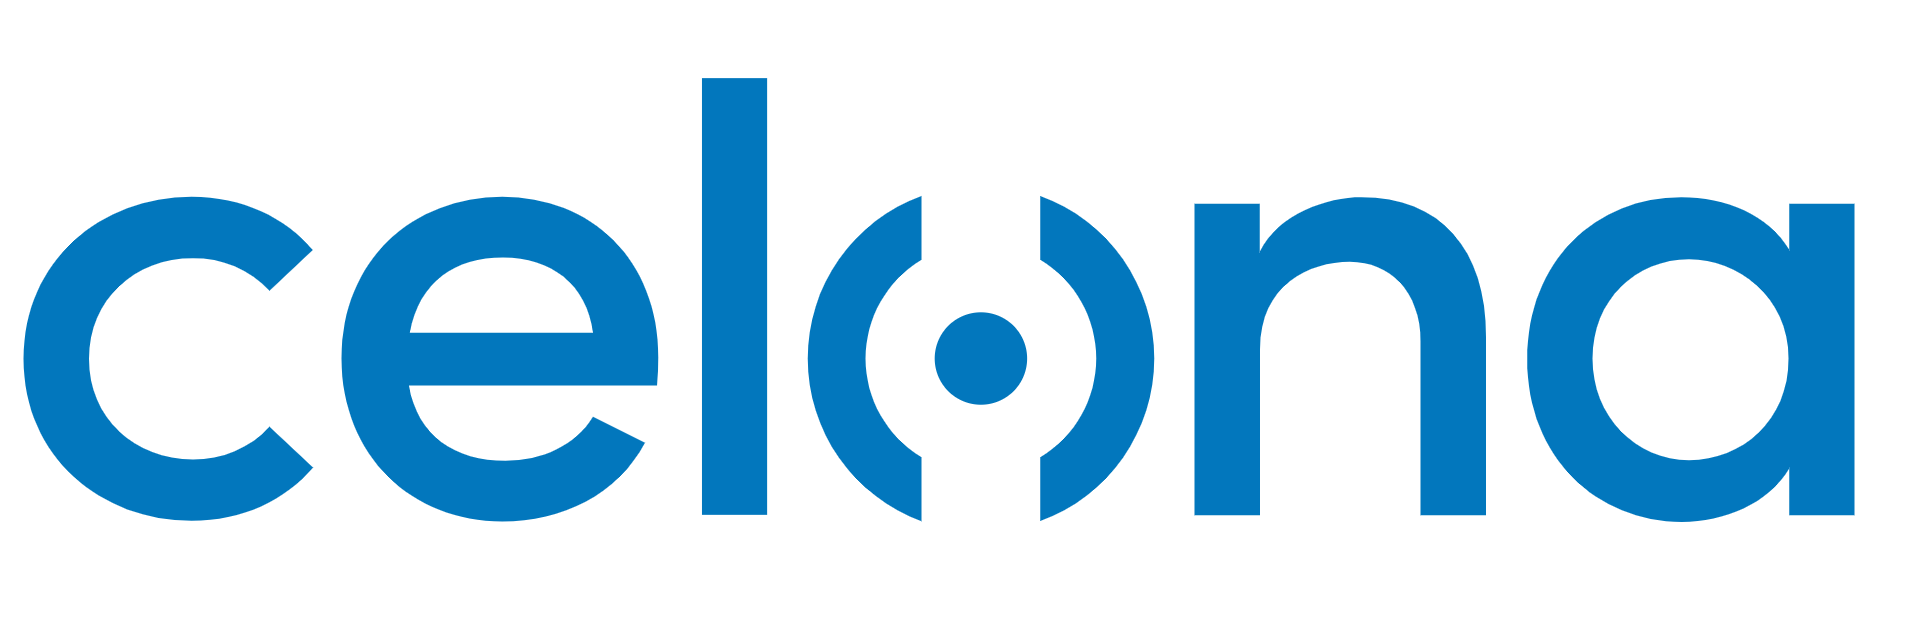 Celona Logo 2Kx2K-2